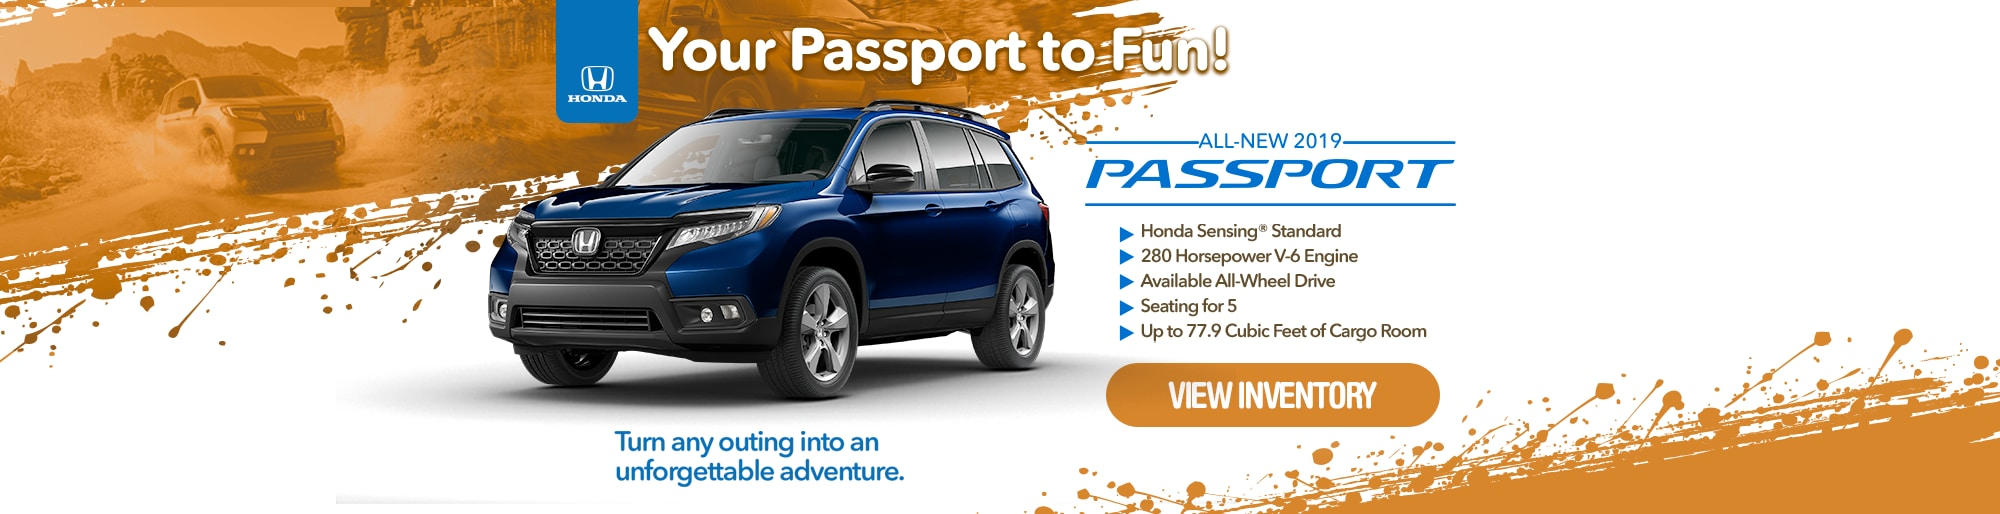 Craigslist Washington Dc Cars And Trucks >> New Used Honda Cars Trucks Suvs College Park Honda